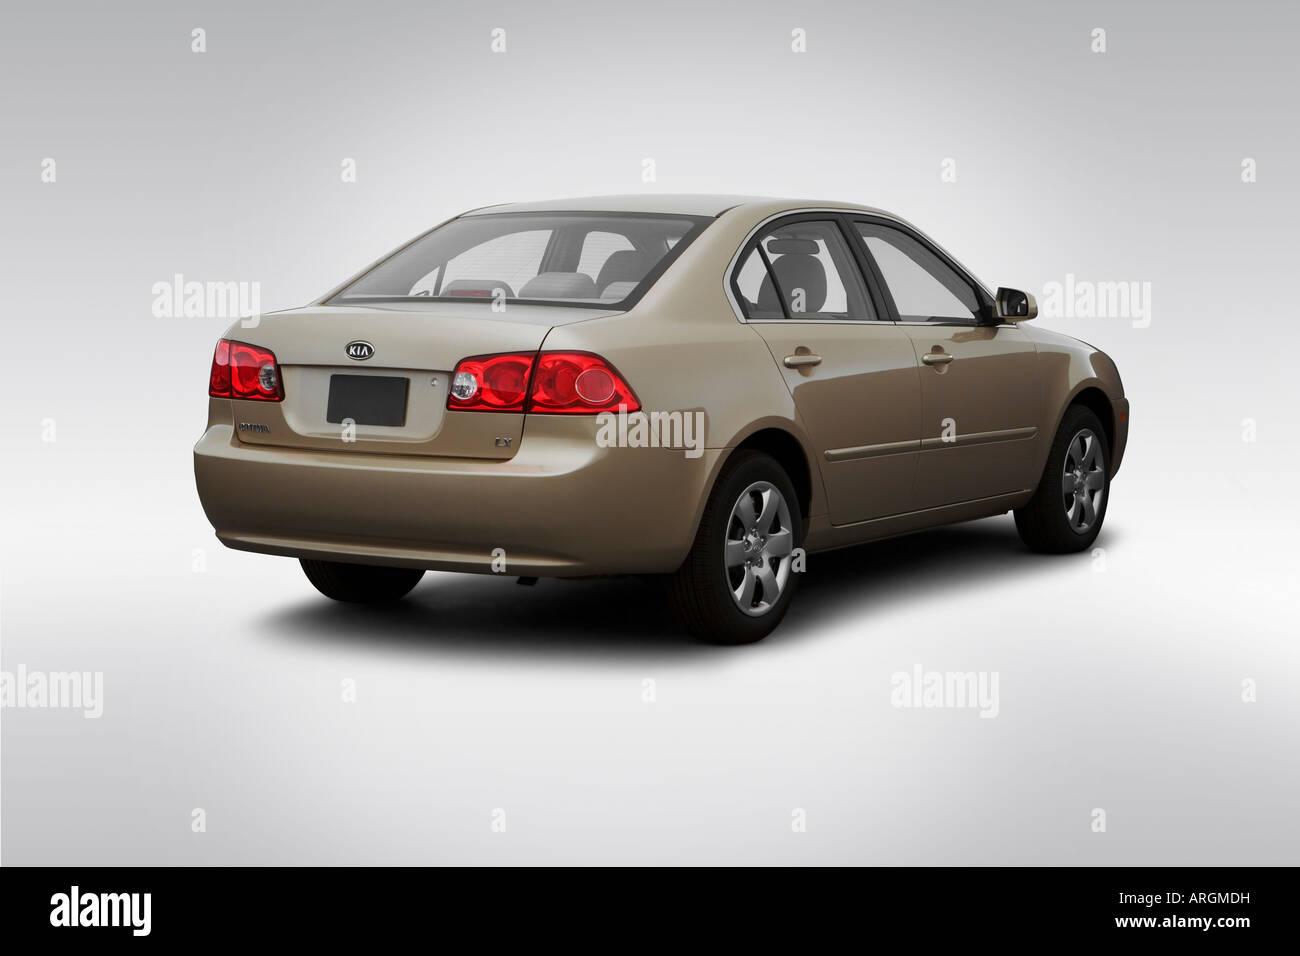 2007 Kia Optima LX In Beige   Rear Angle View   Stock Image